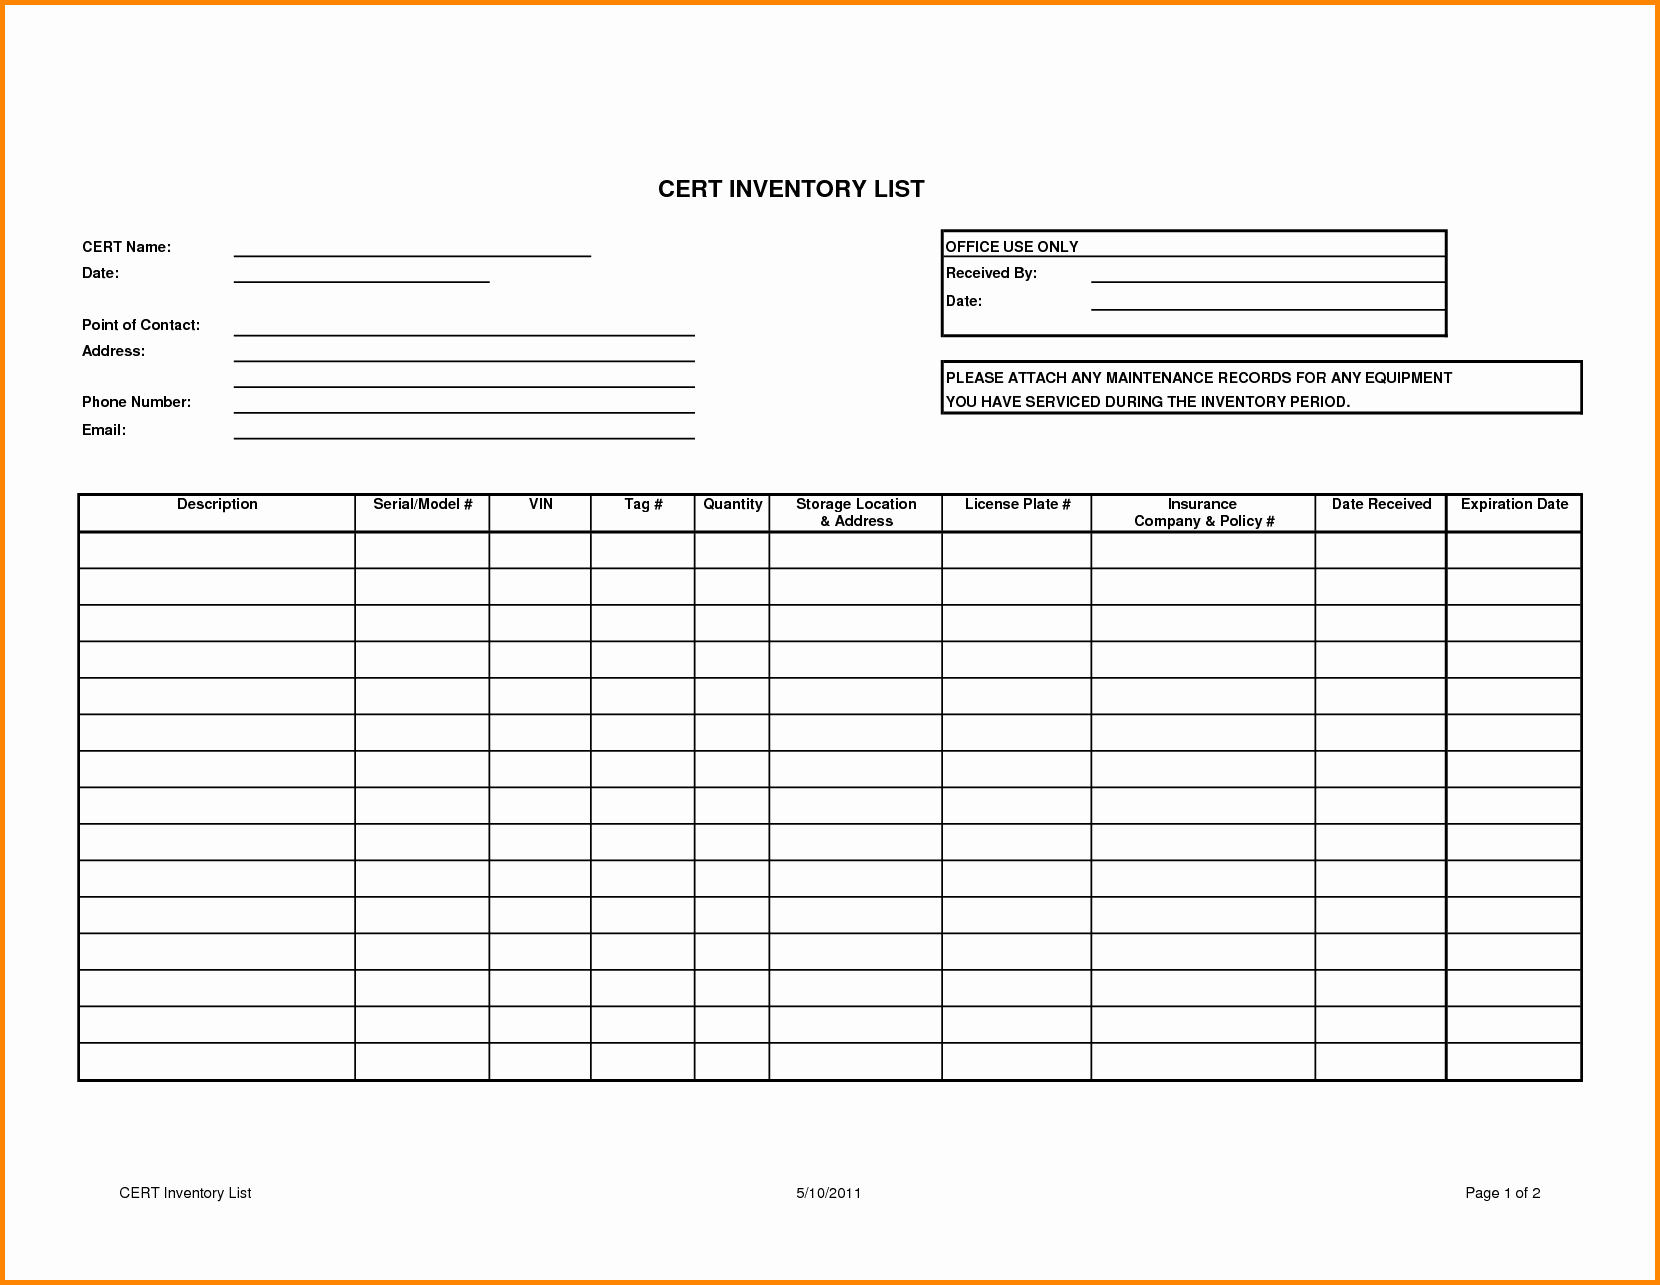 Liquor Inventory Control Spreadsheet Beautiful Inventory